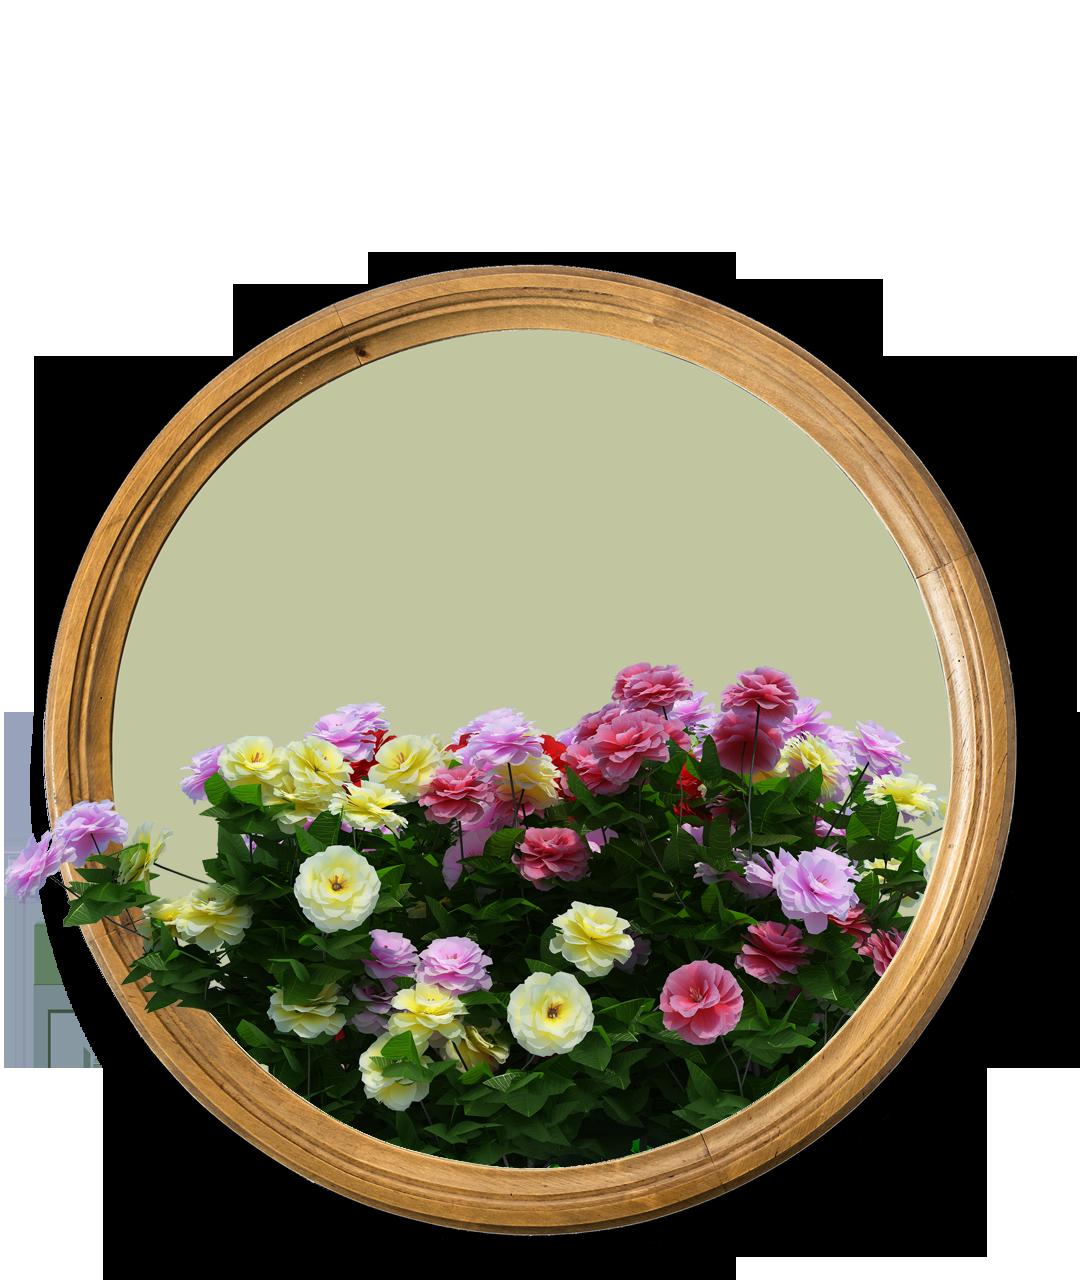 Vybornų medelynas - vienmetės gėlės